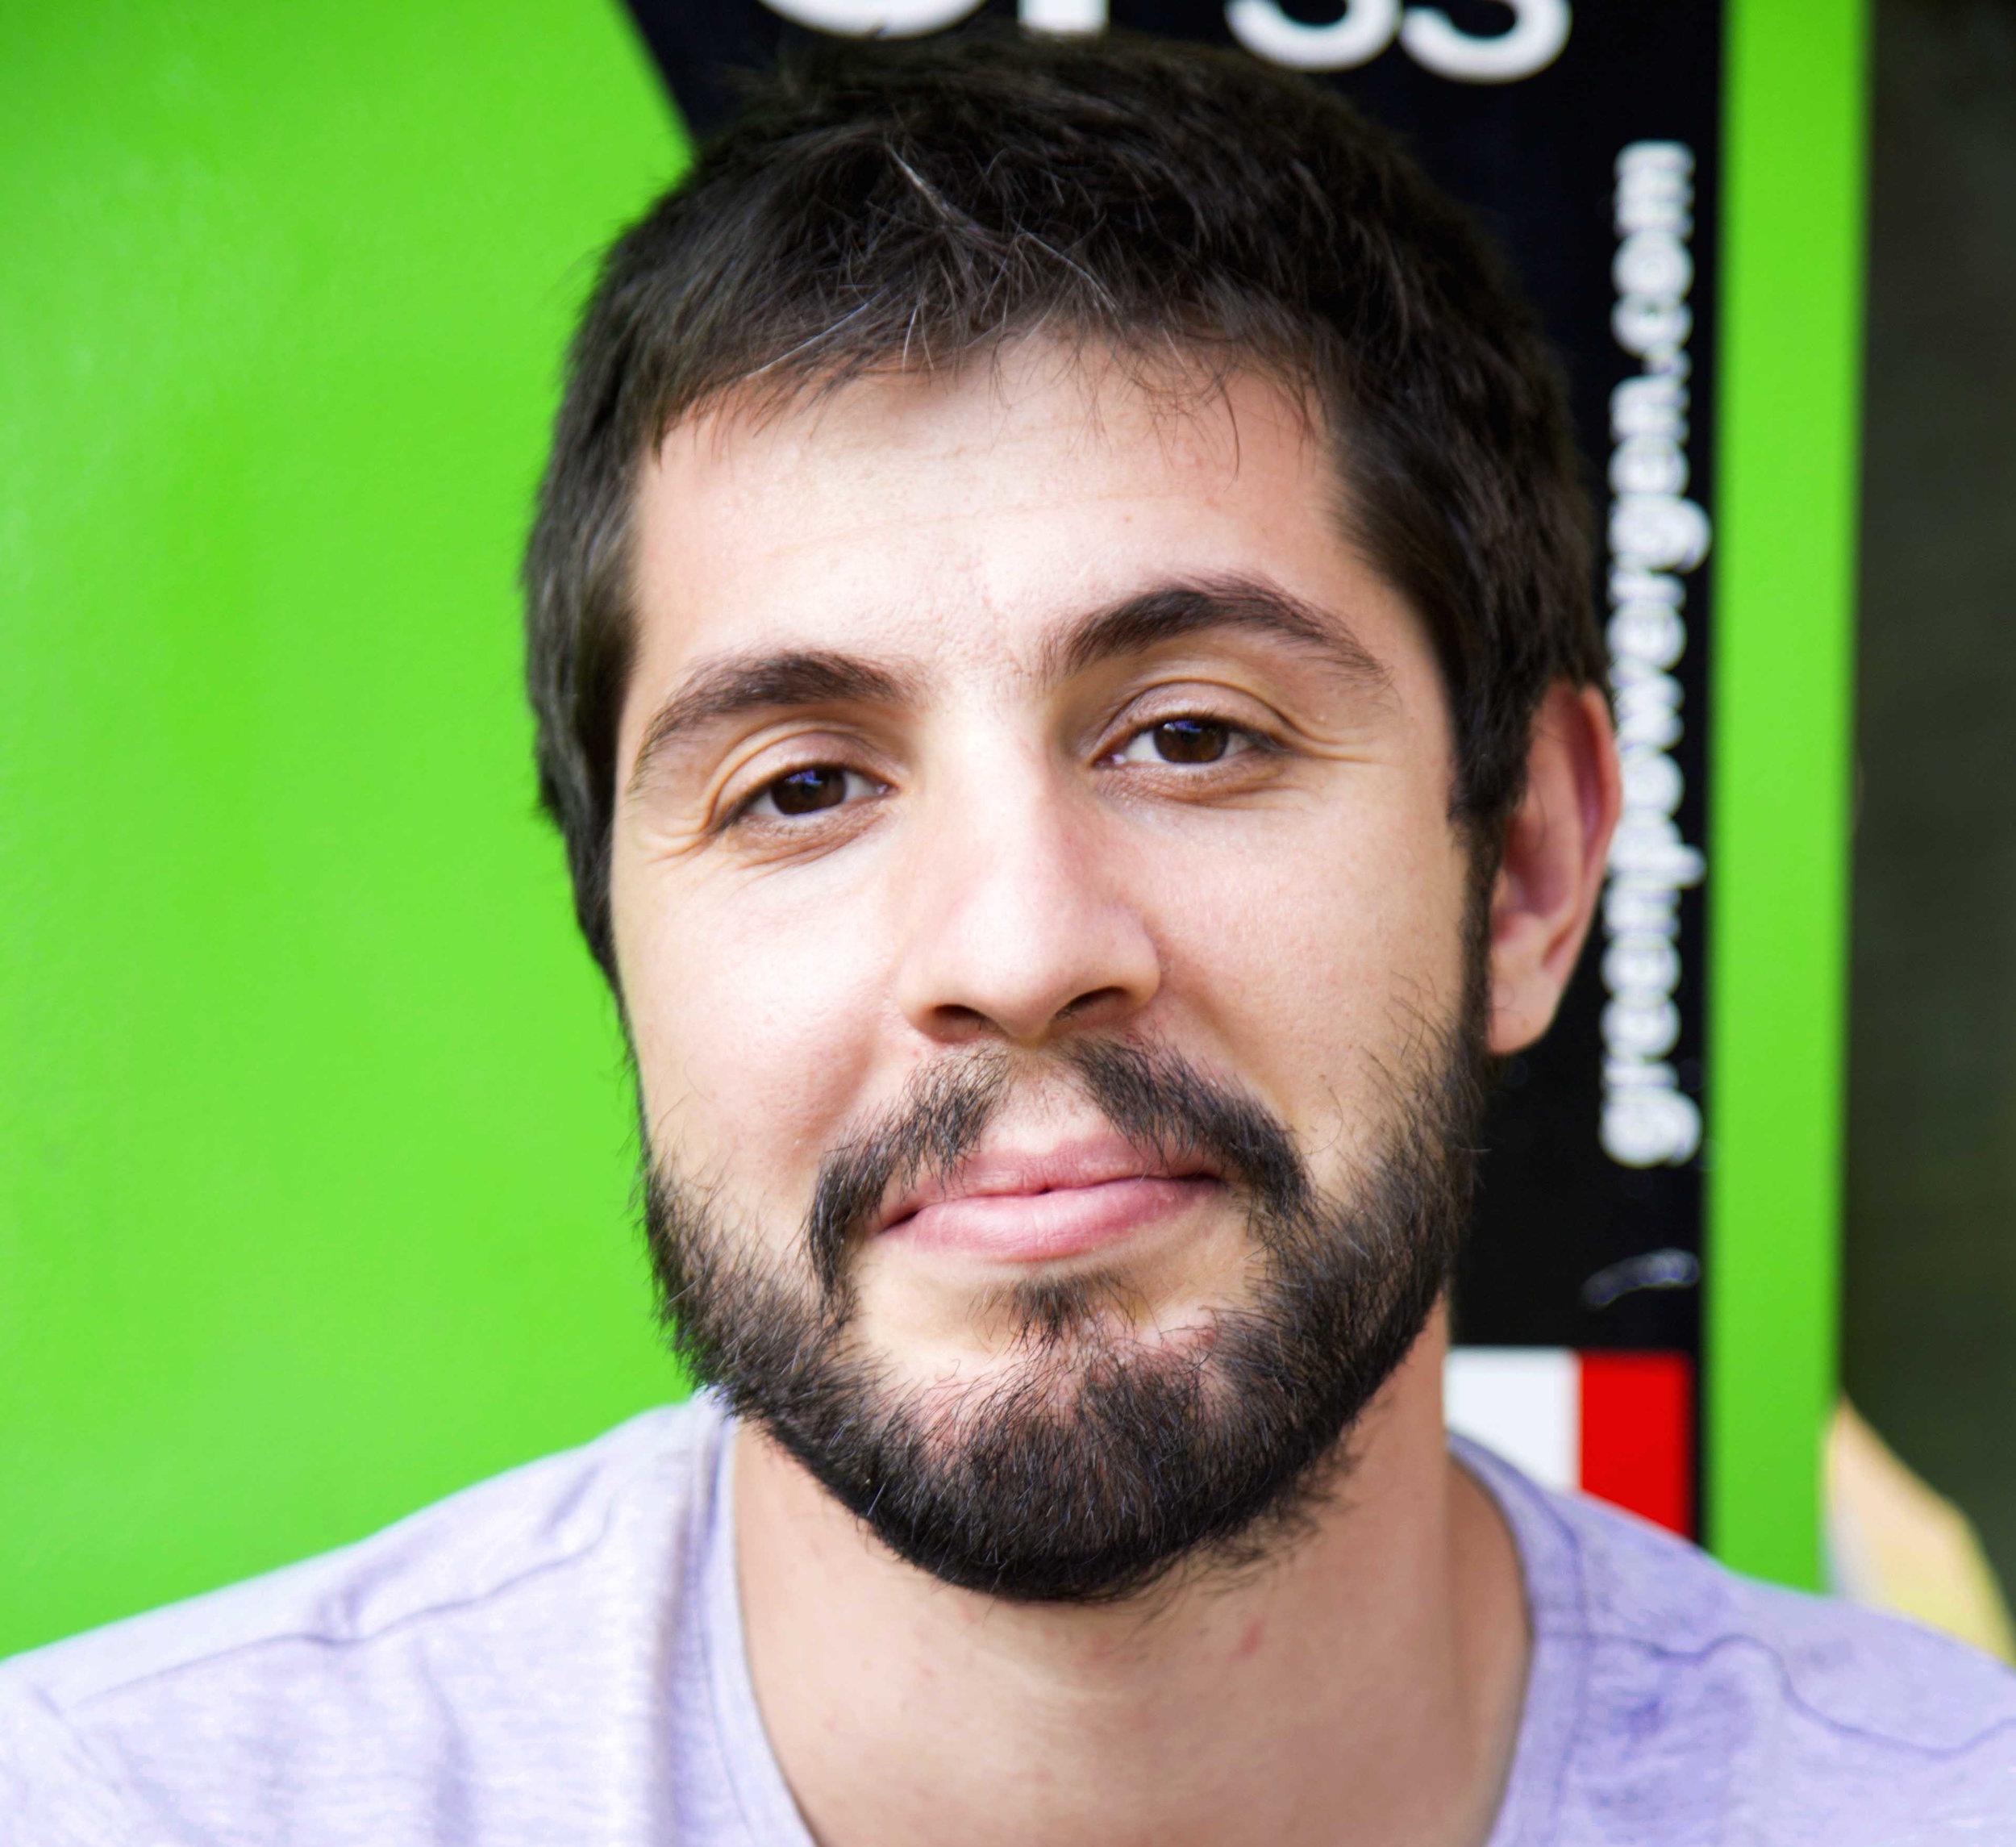 Tristan Kochoyan, Power:On founder